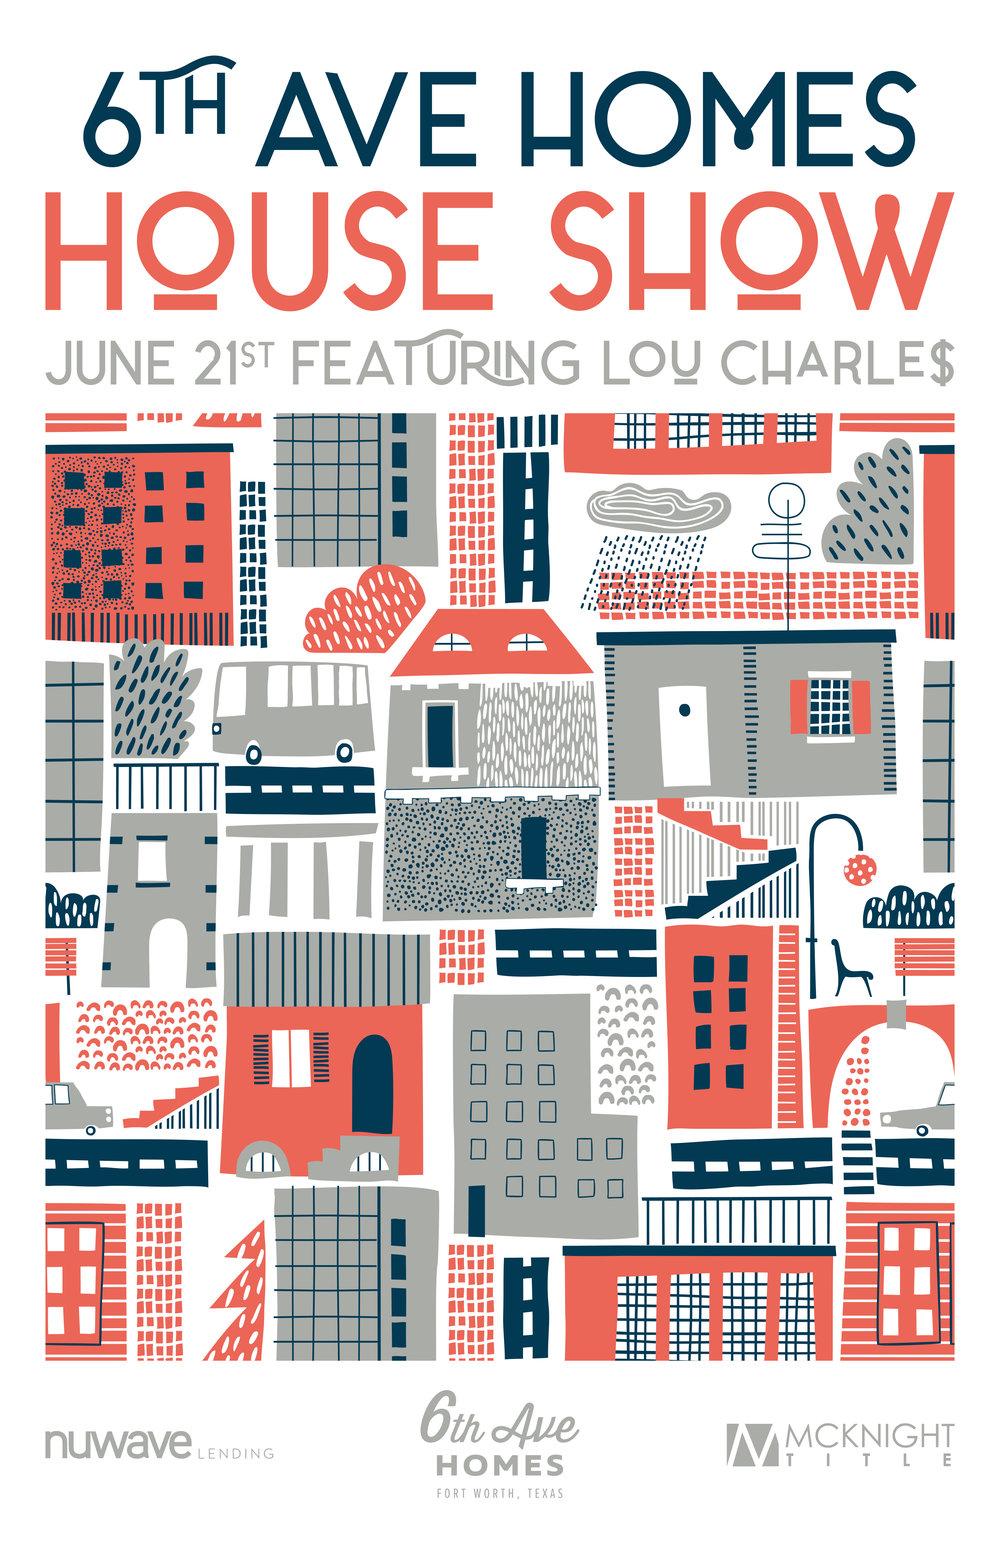 Lou CharLe$